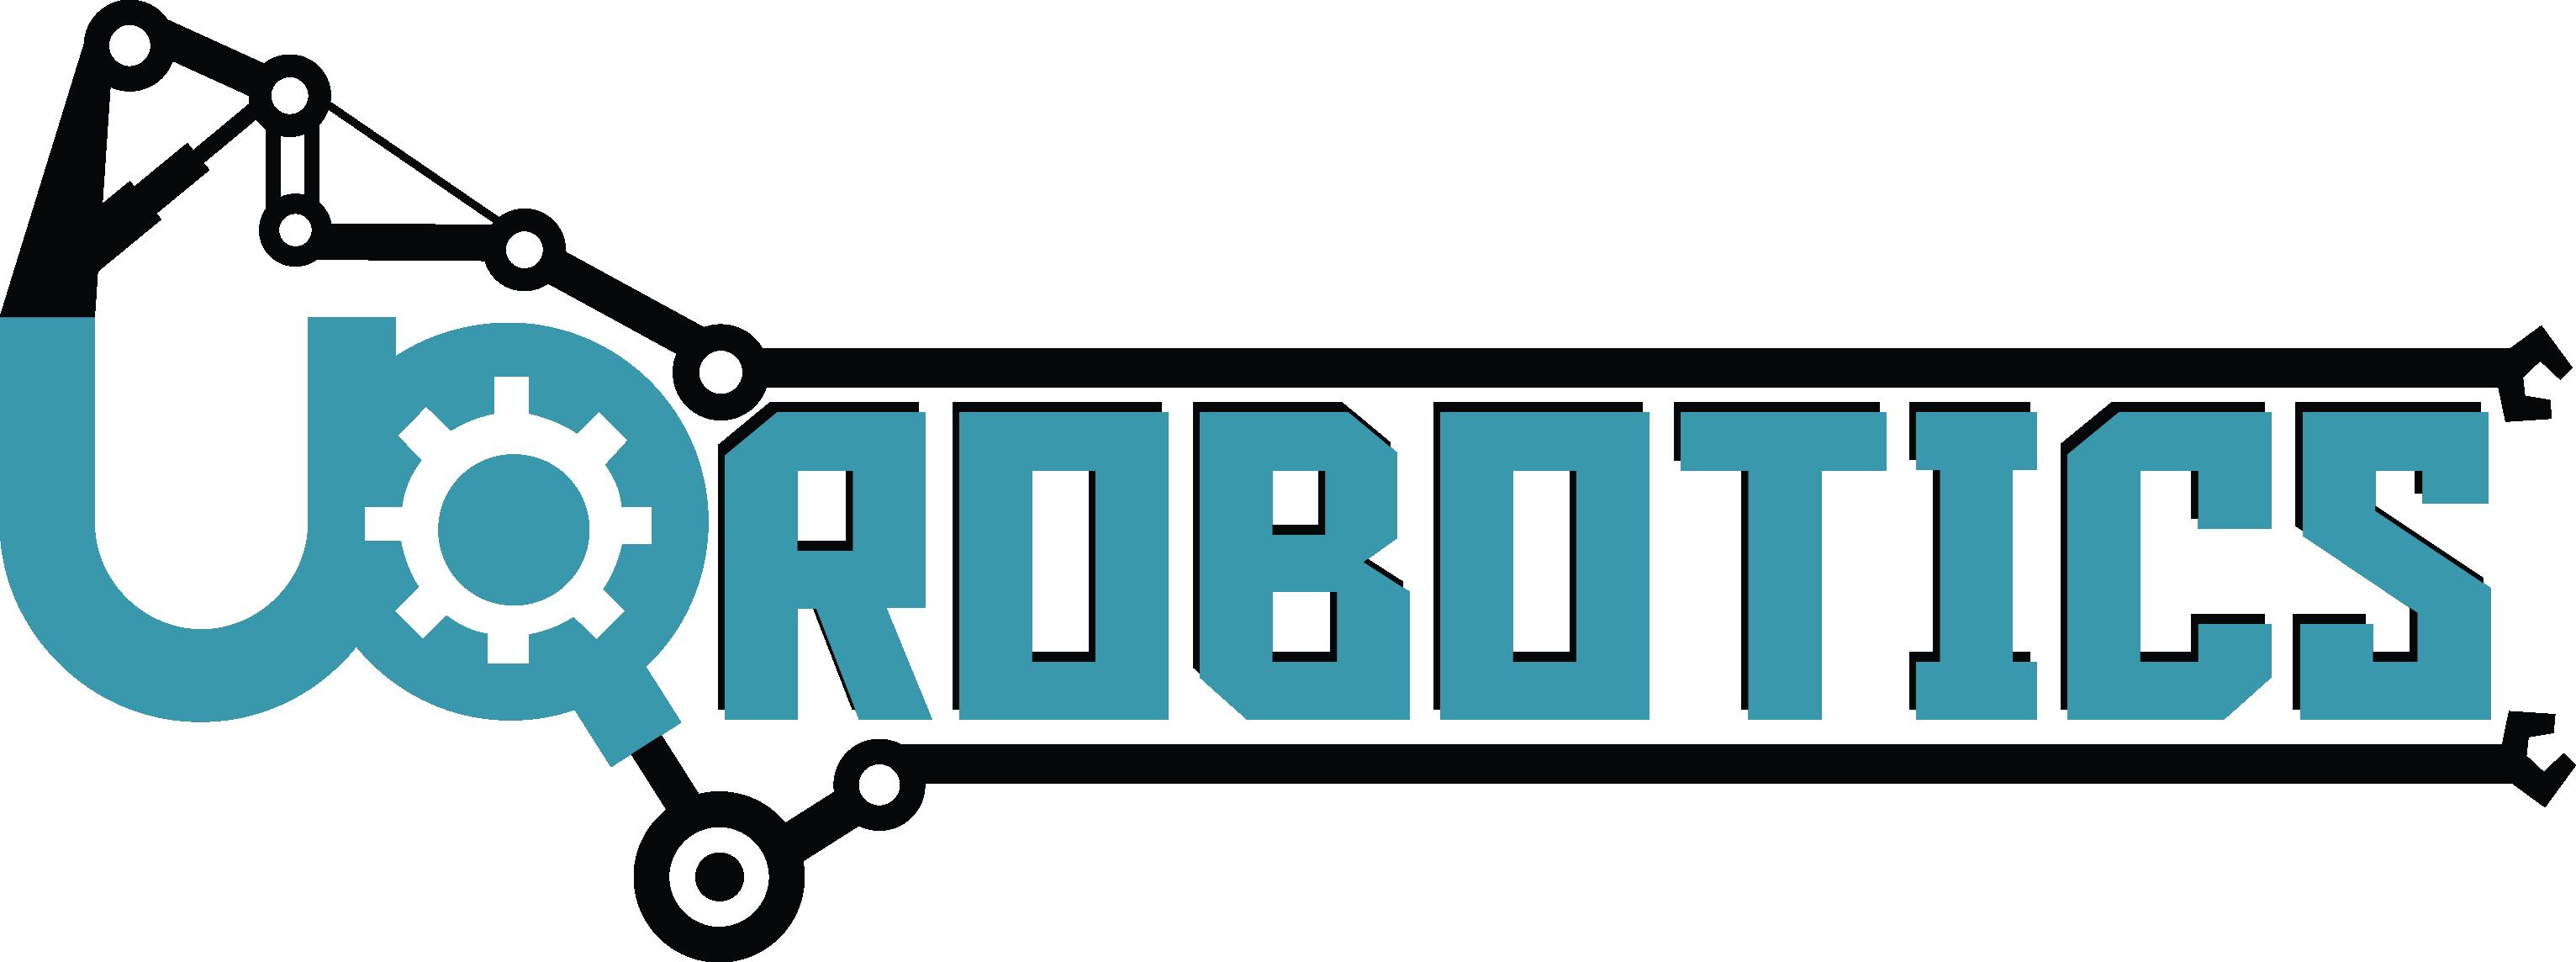 Saturday Academy Robotics Club